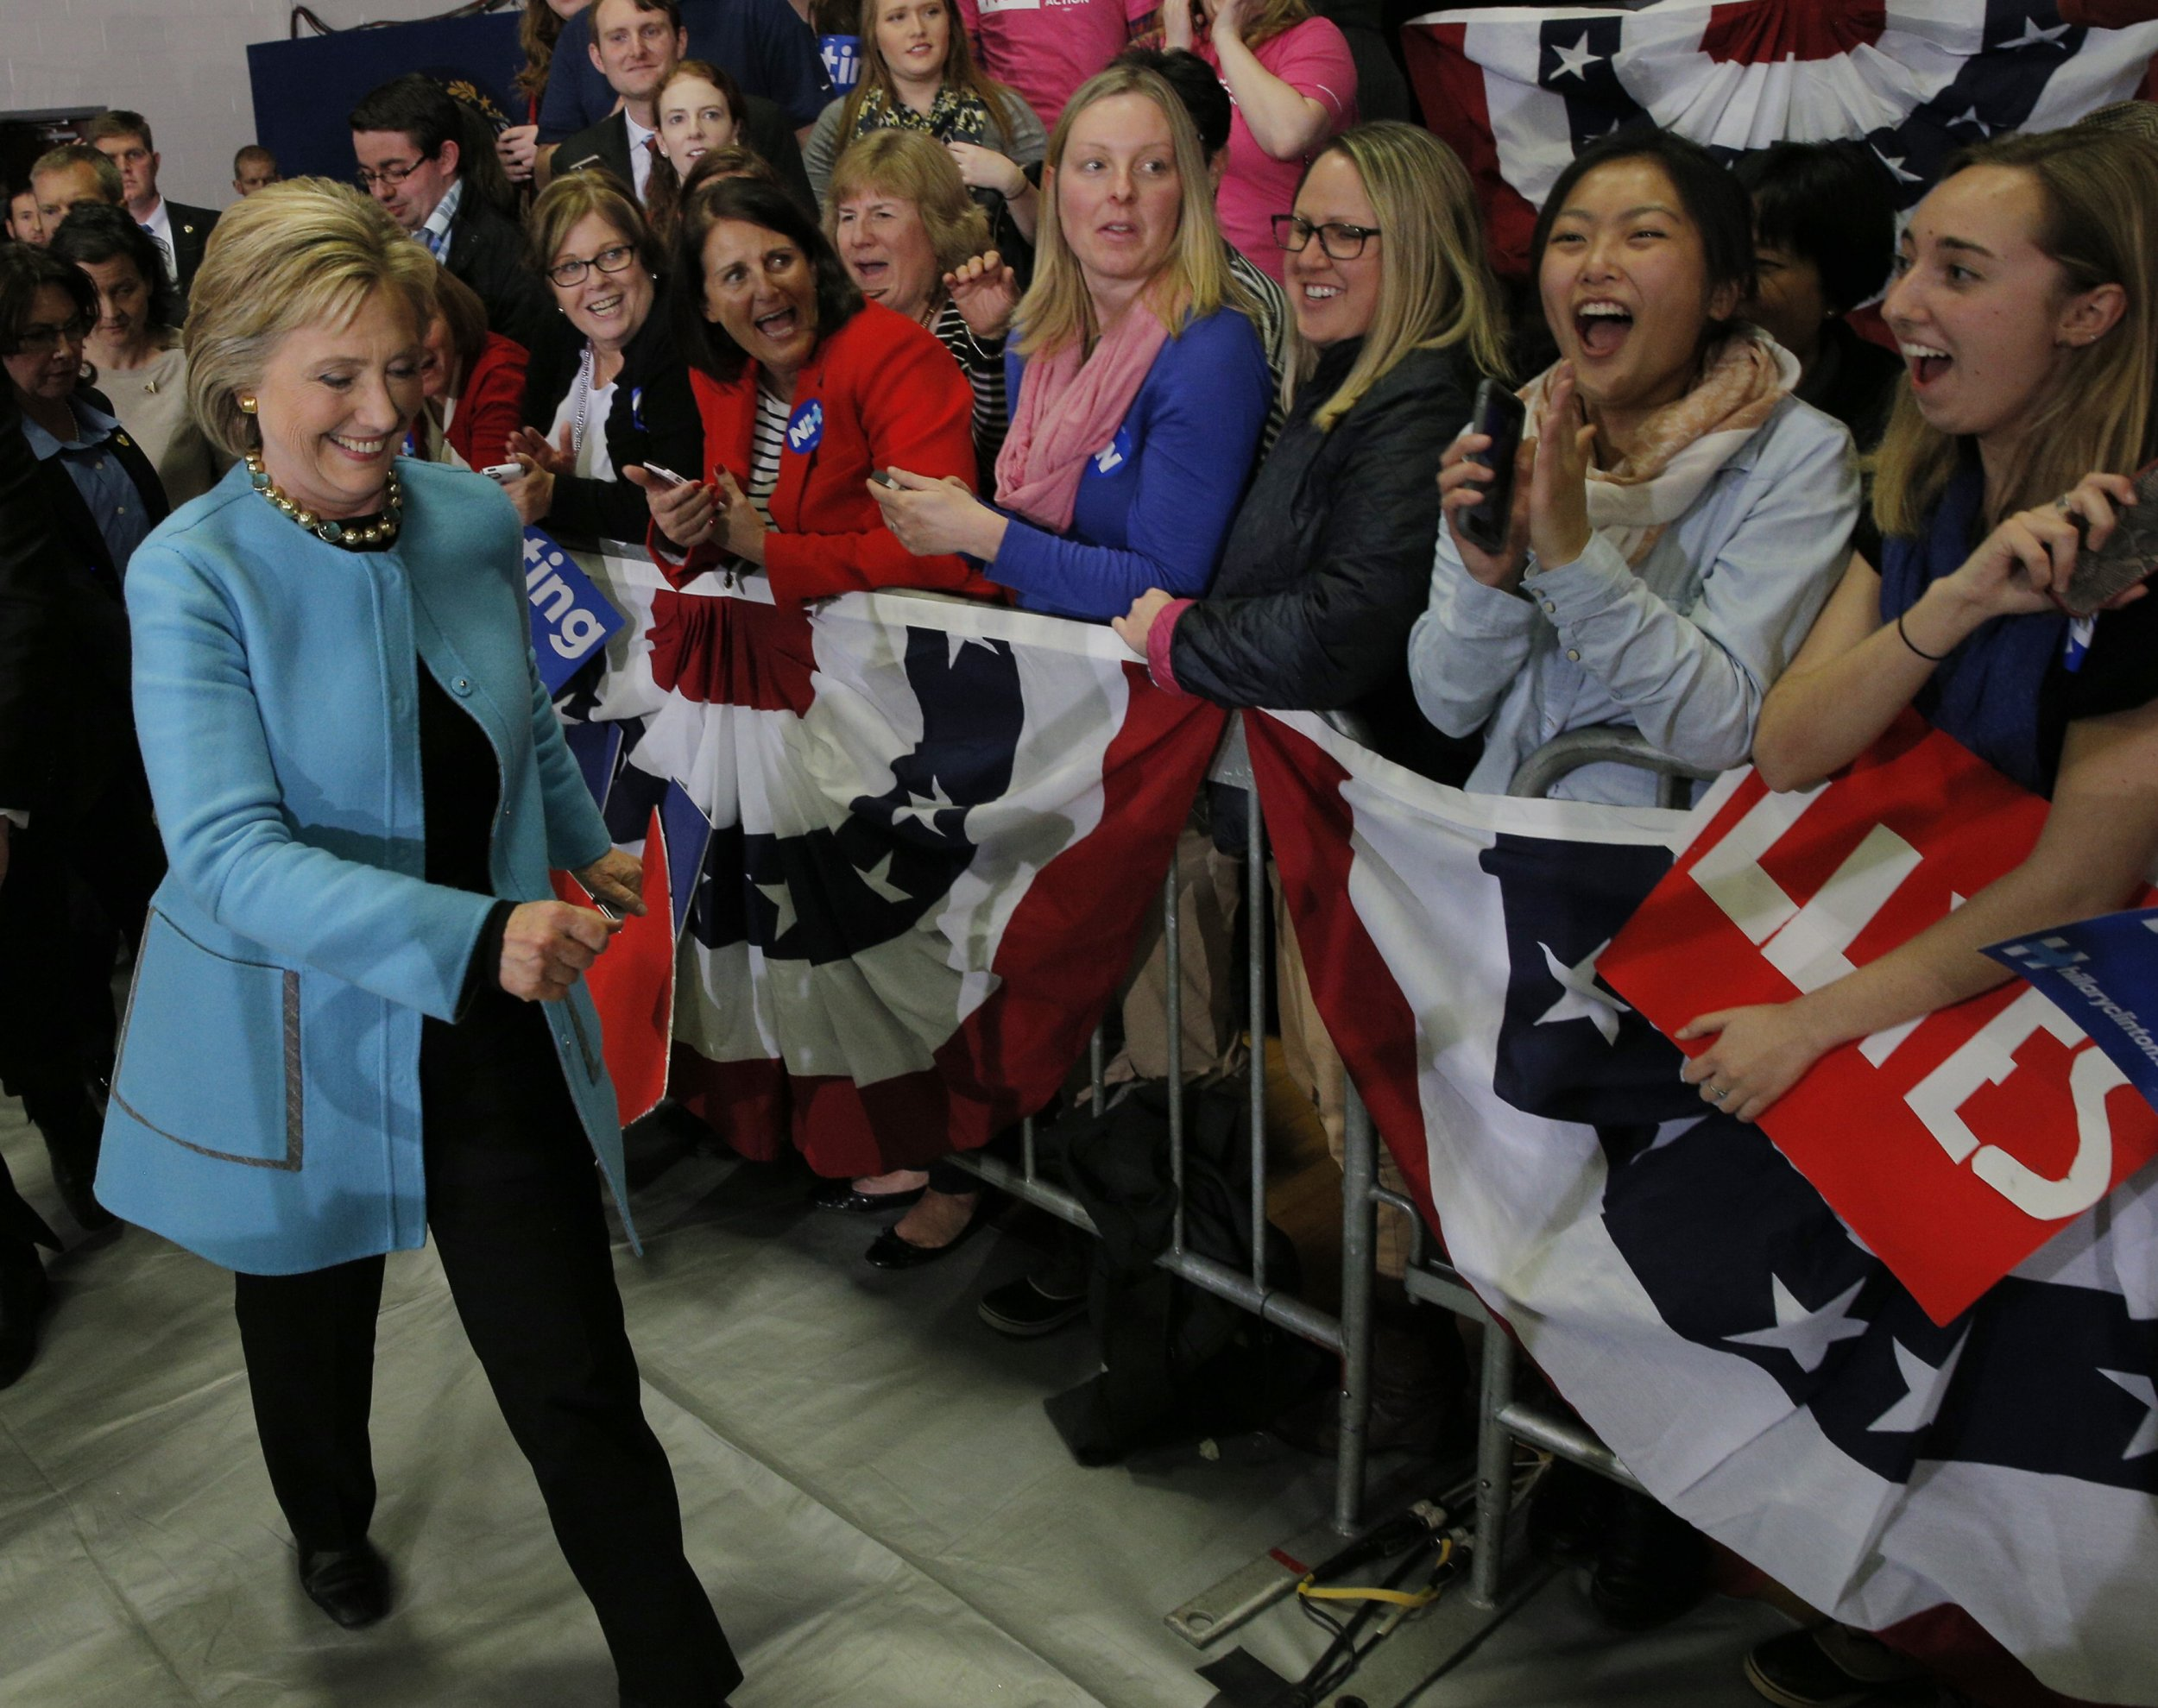 Hillary_Clinton_Goldman_Sachs_Speeches